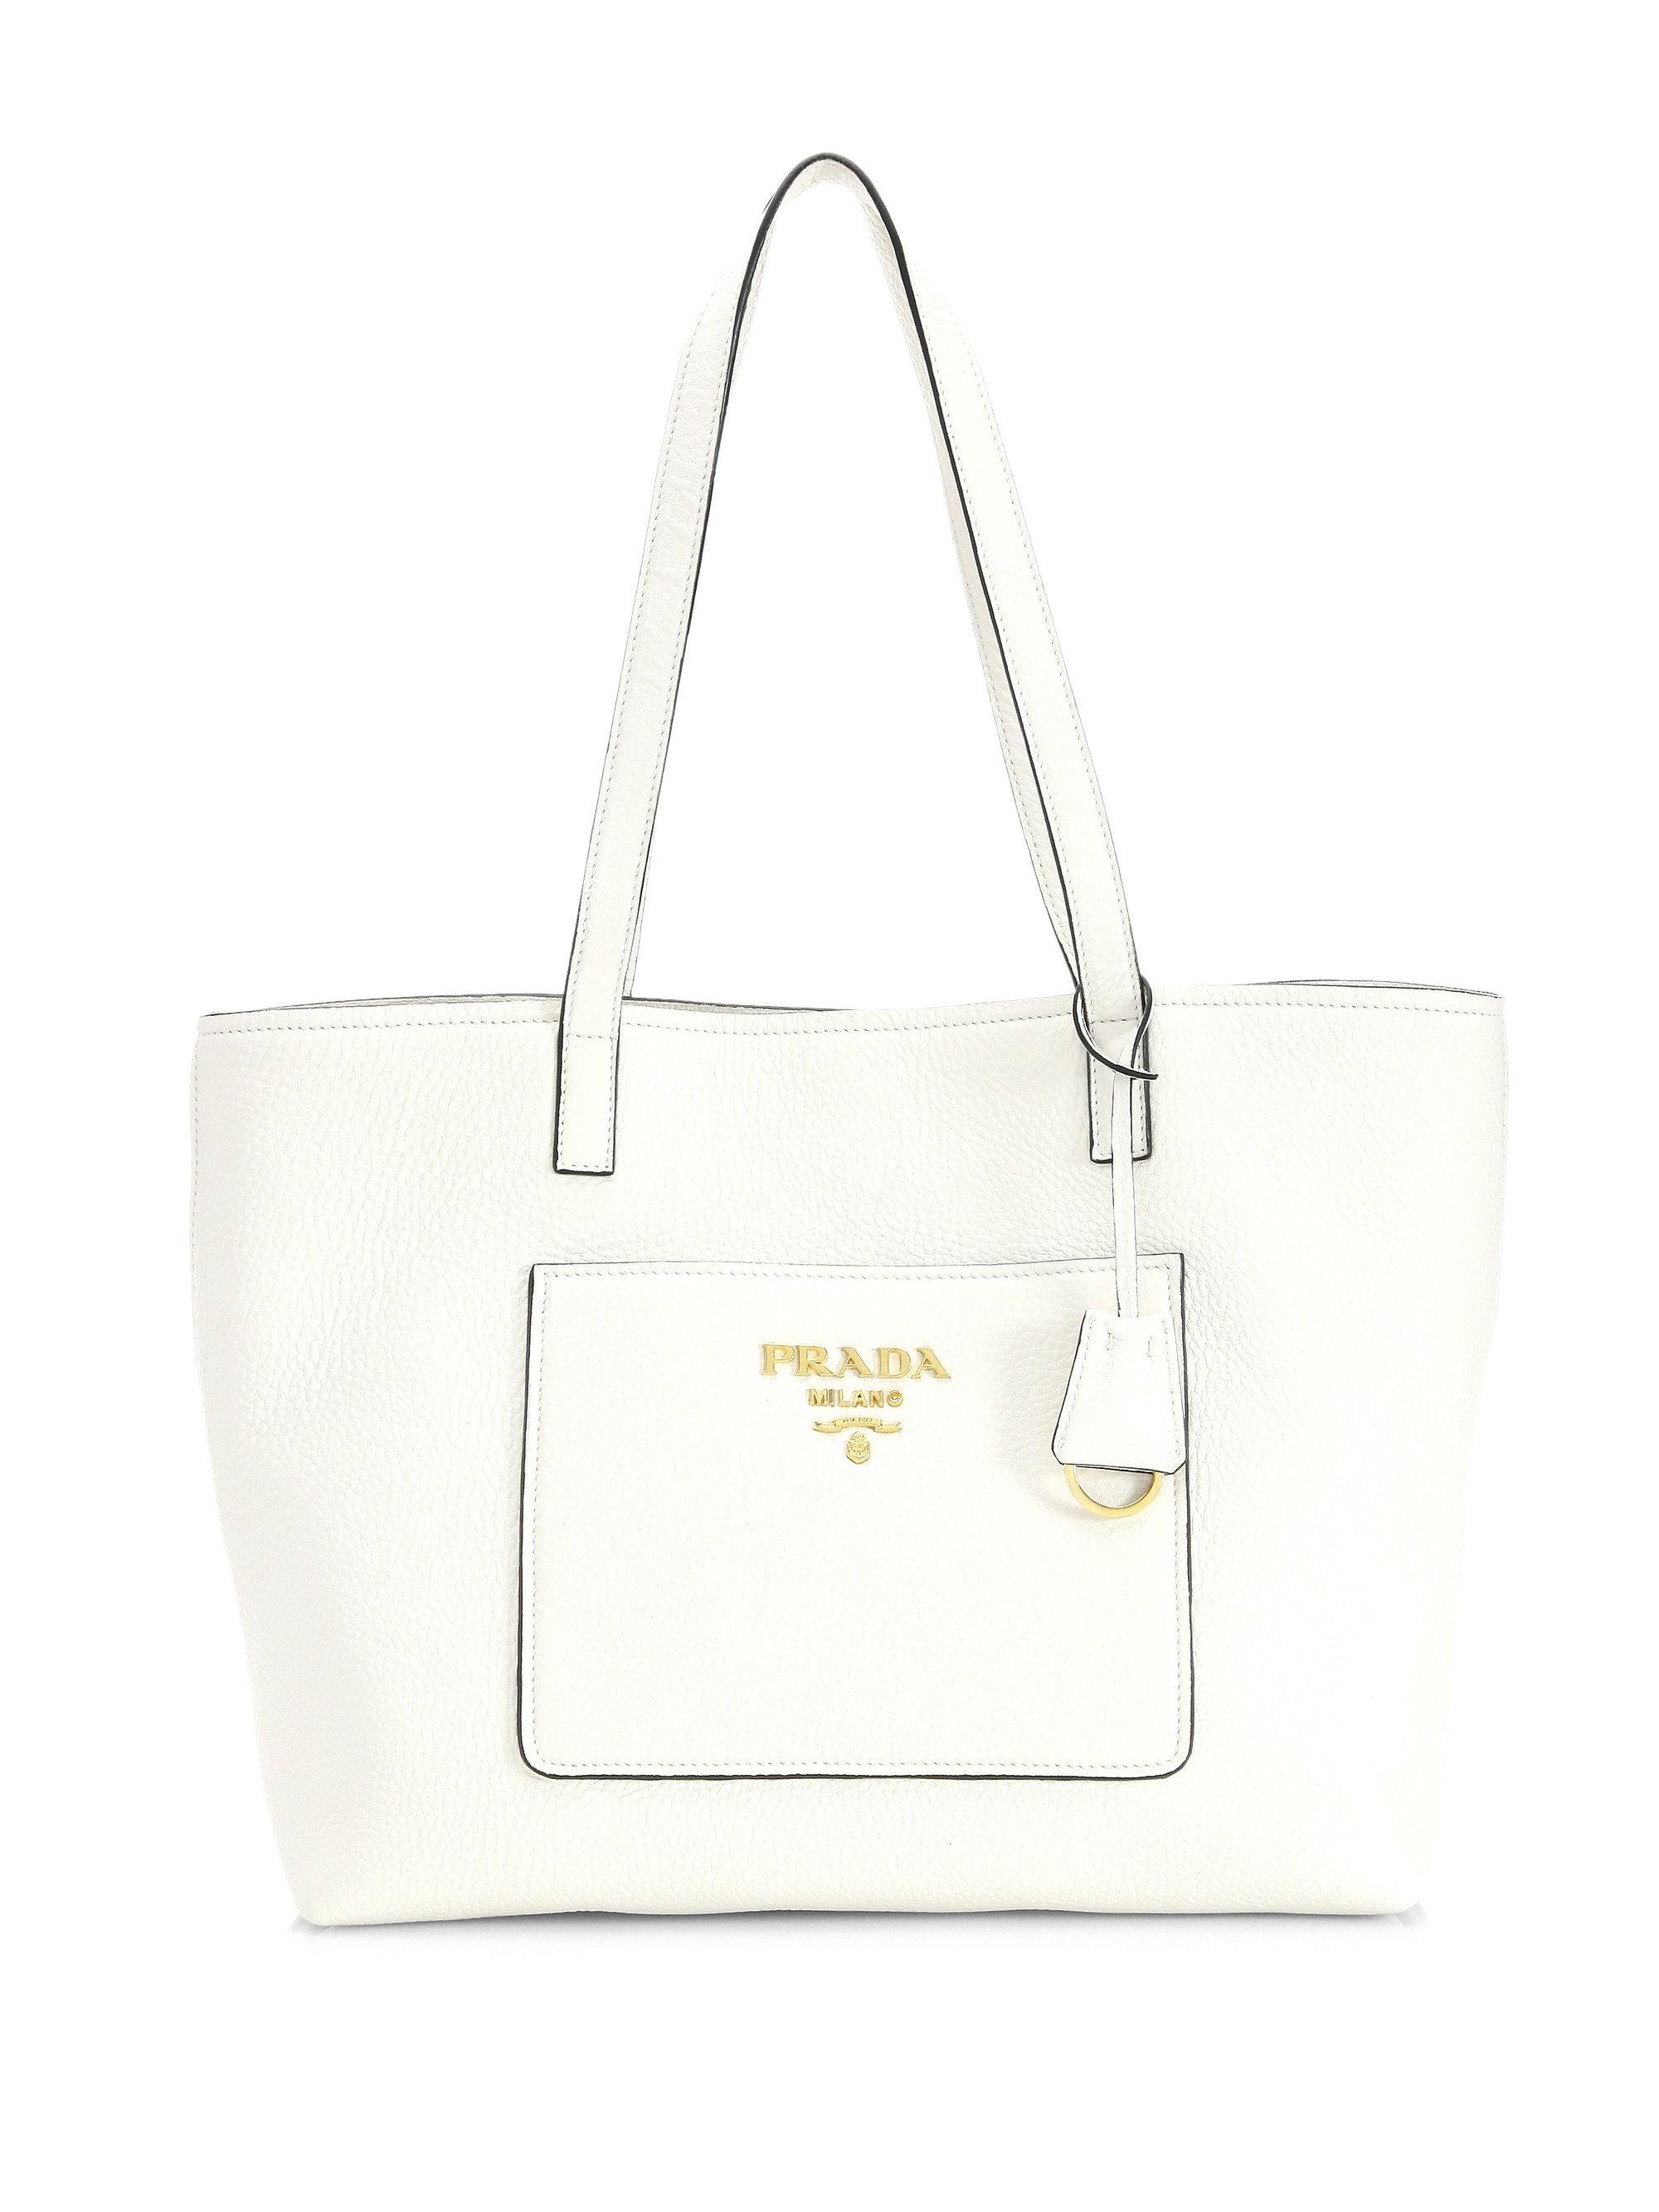 36af5088a7fa Prada Large Daino Leather Shopper in White - Lyst